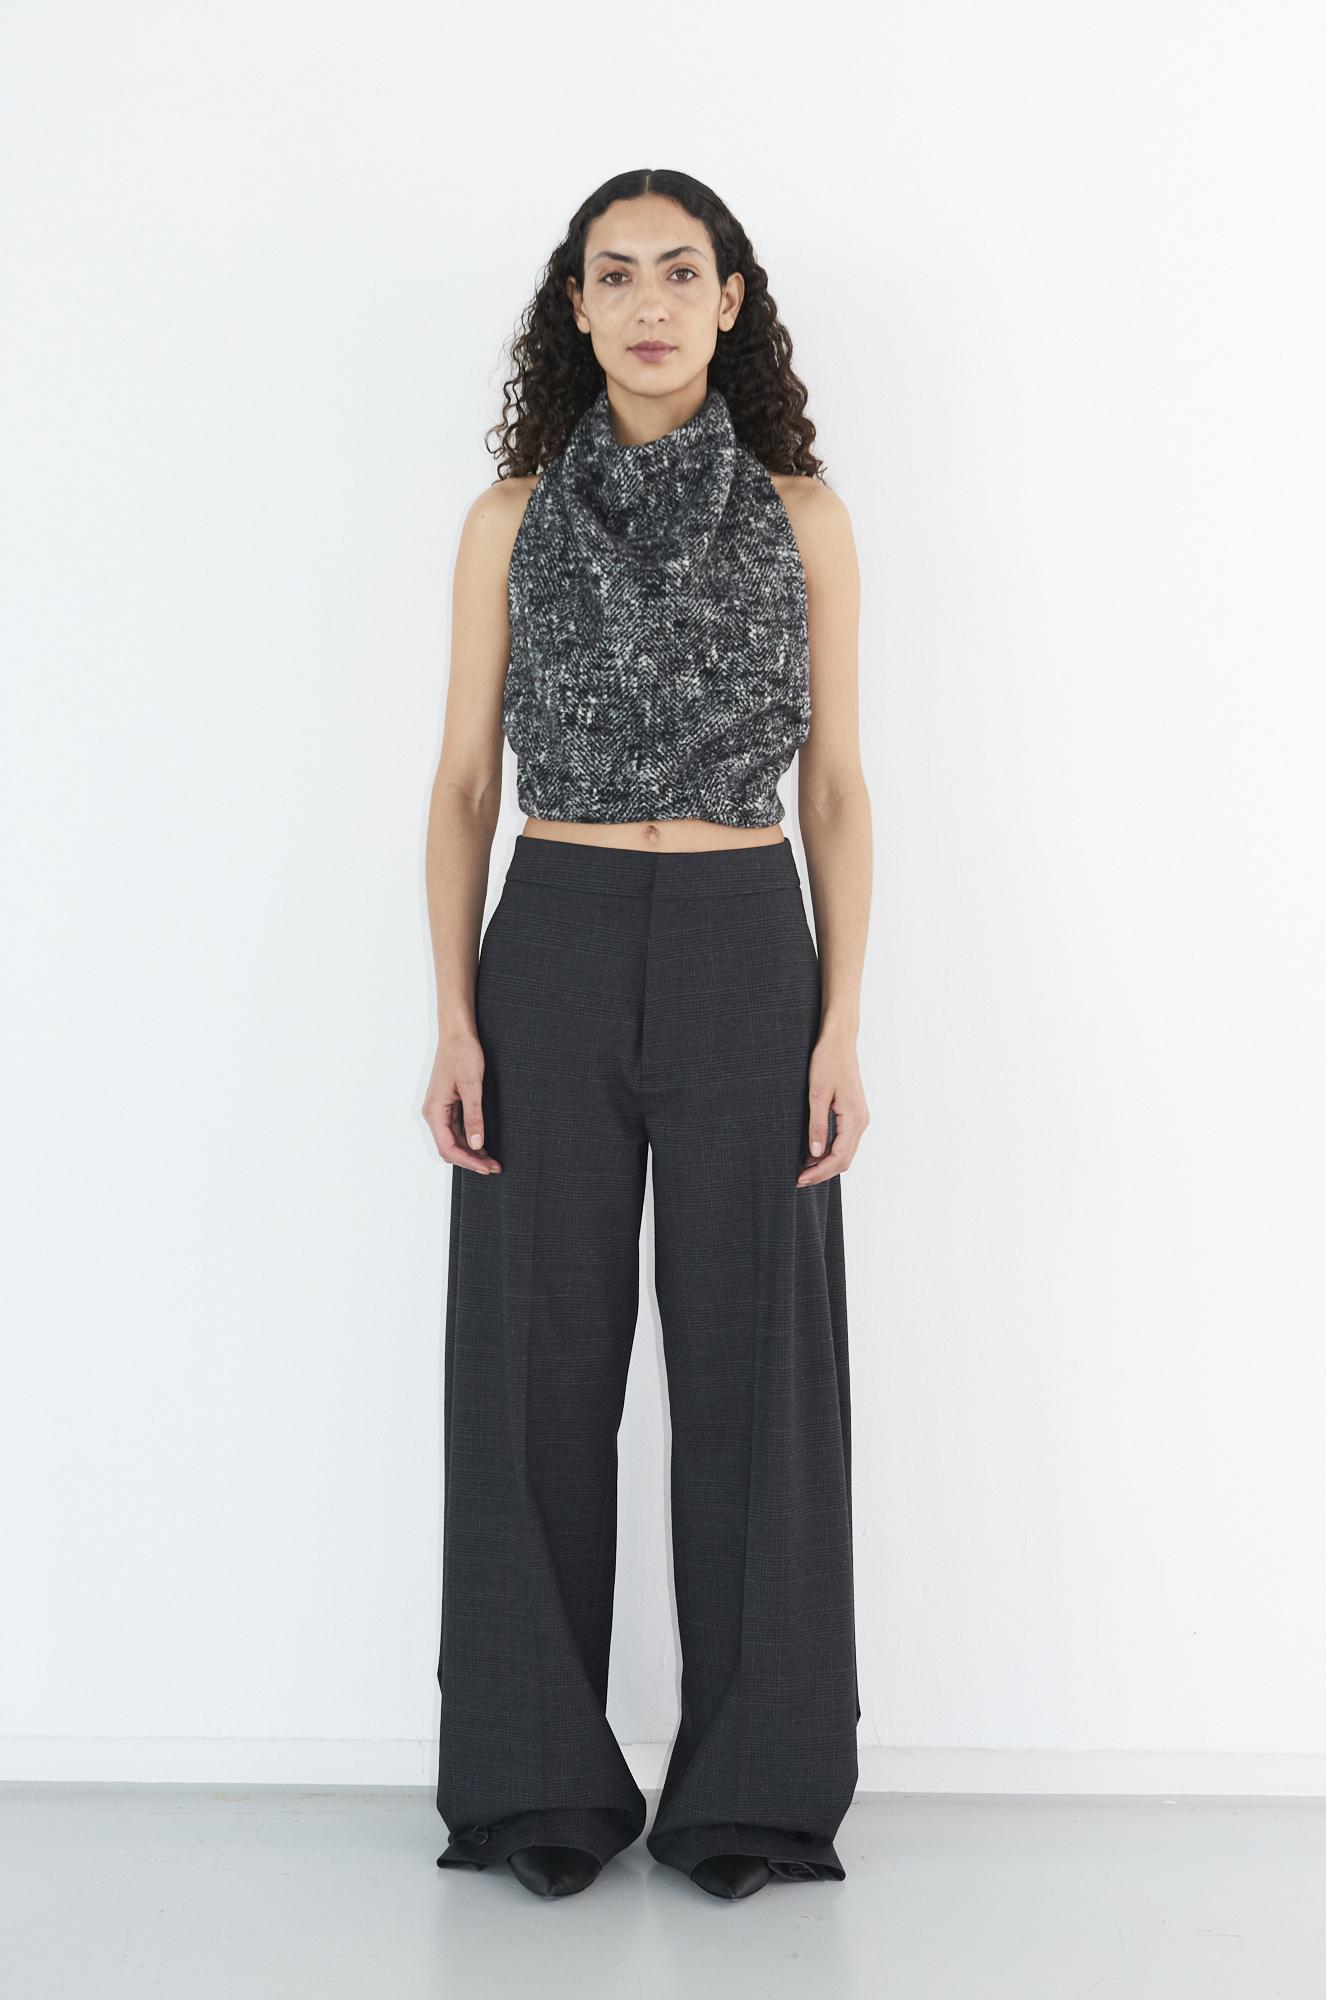 GAUCHERE Fall Winter 2021 Paris Fashion Week LOOK 7 Top TALENA, Trousers TEKIN, Shoes PILLOW PUMP